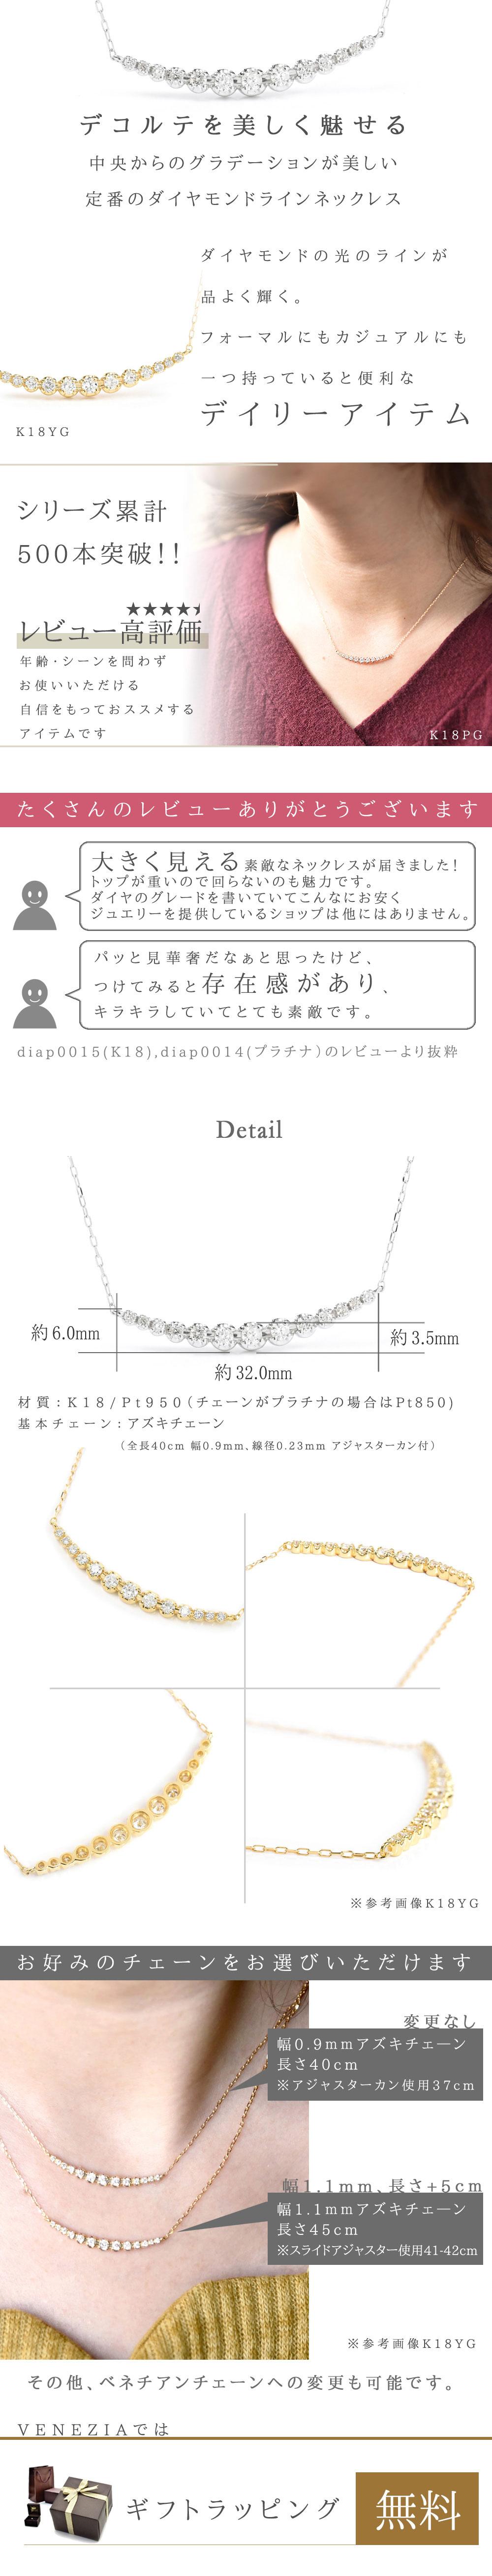 K18ダイヤモンドラインネックレス